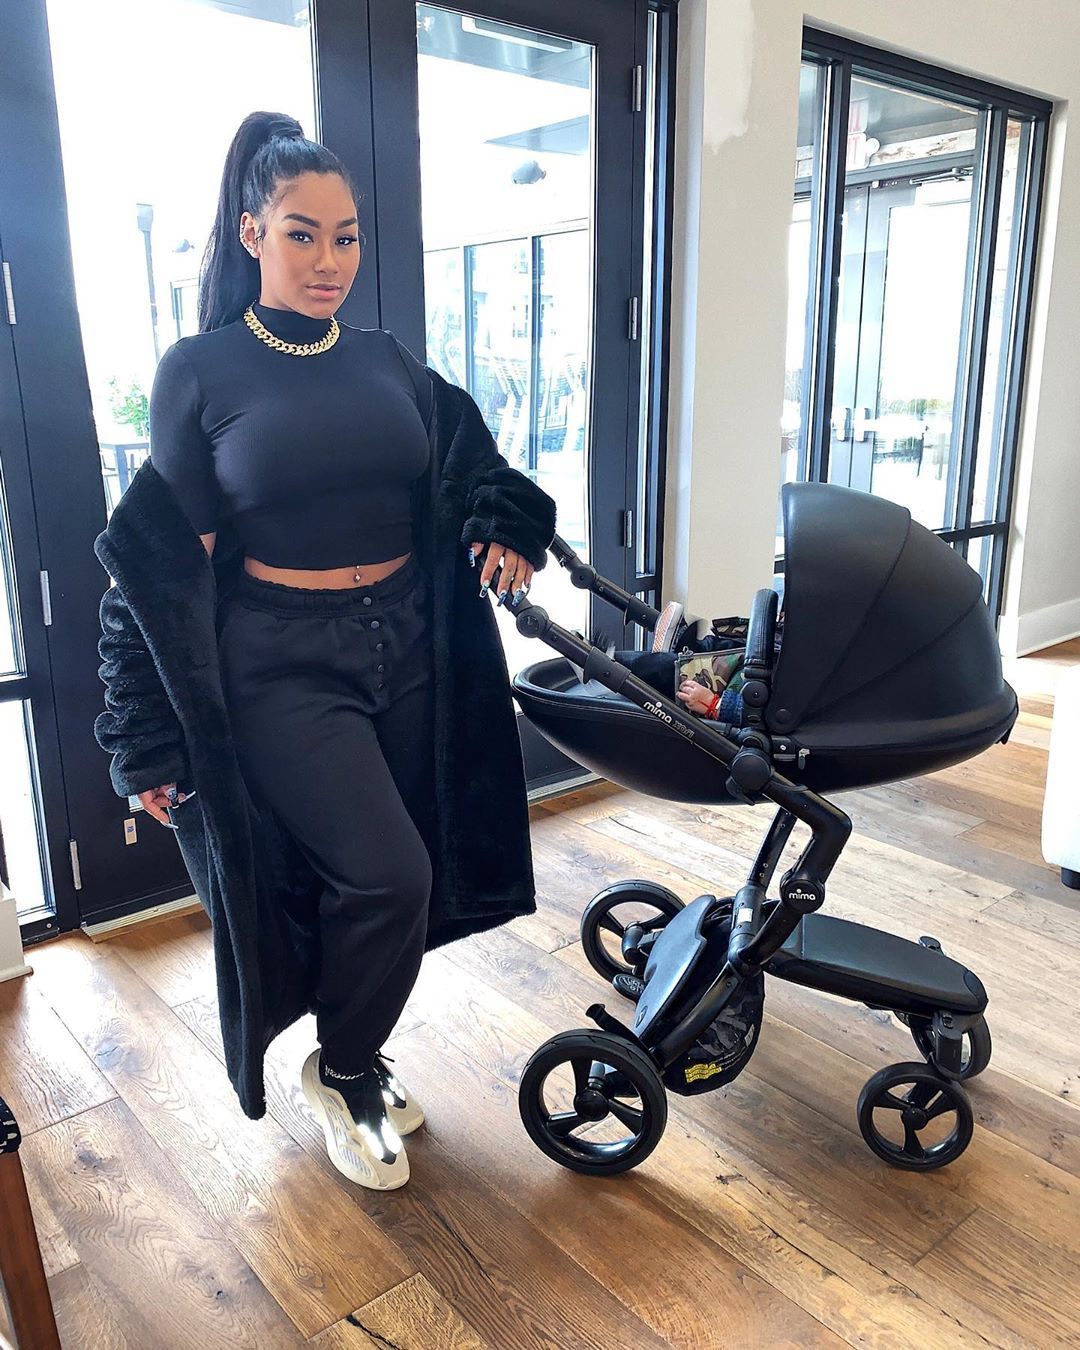 Pin by Lauren... on Cute in 2020 Mima xari, Baby